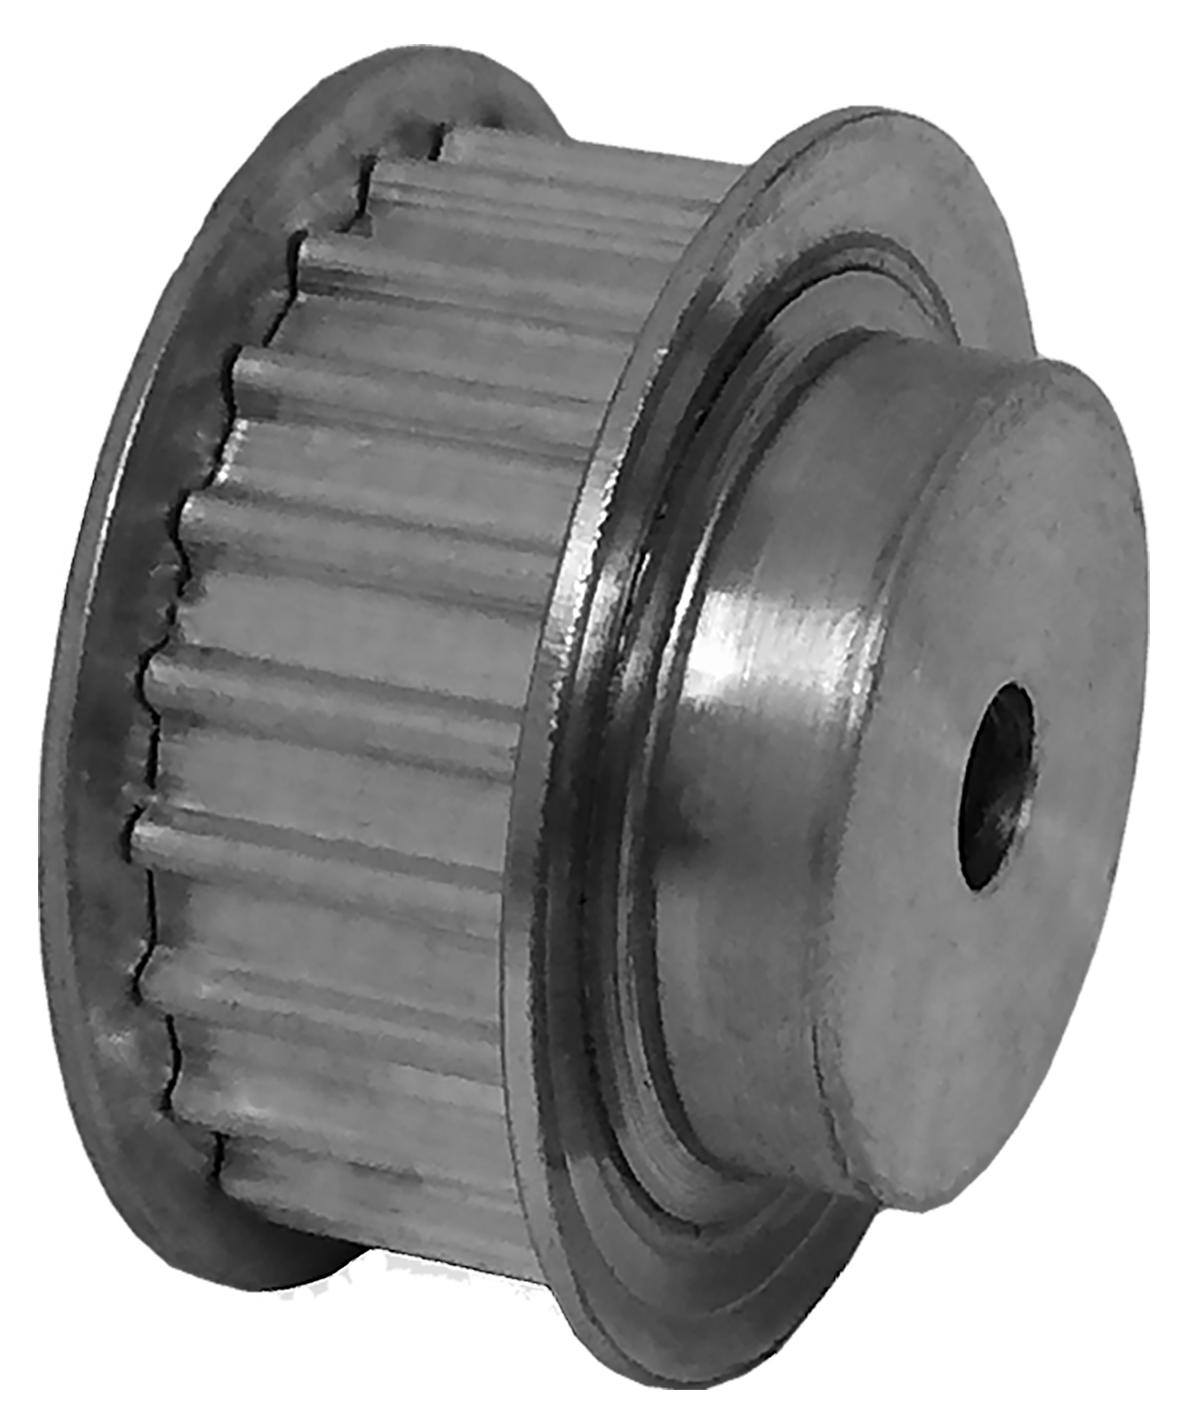 21AT5/22-2 - Aluminum Metric Pulleys